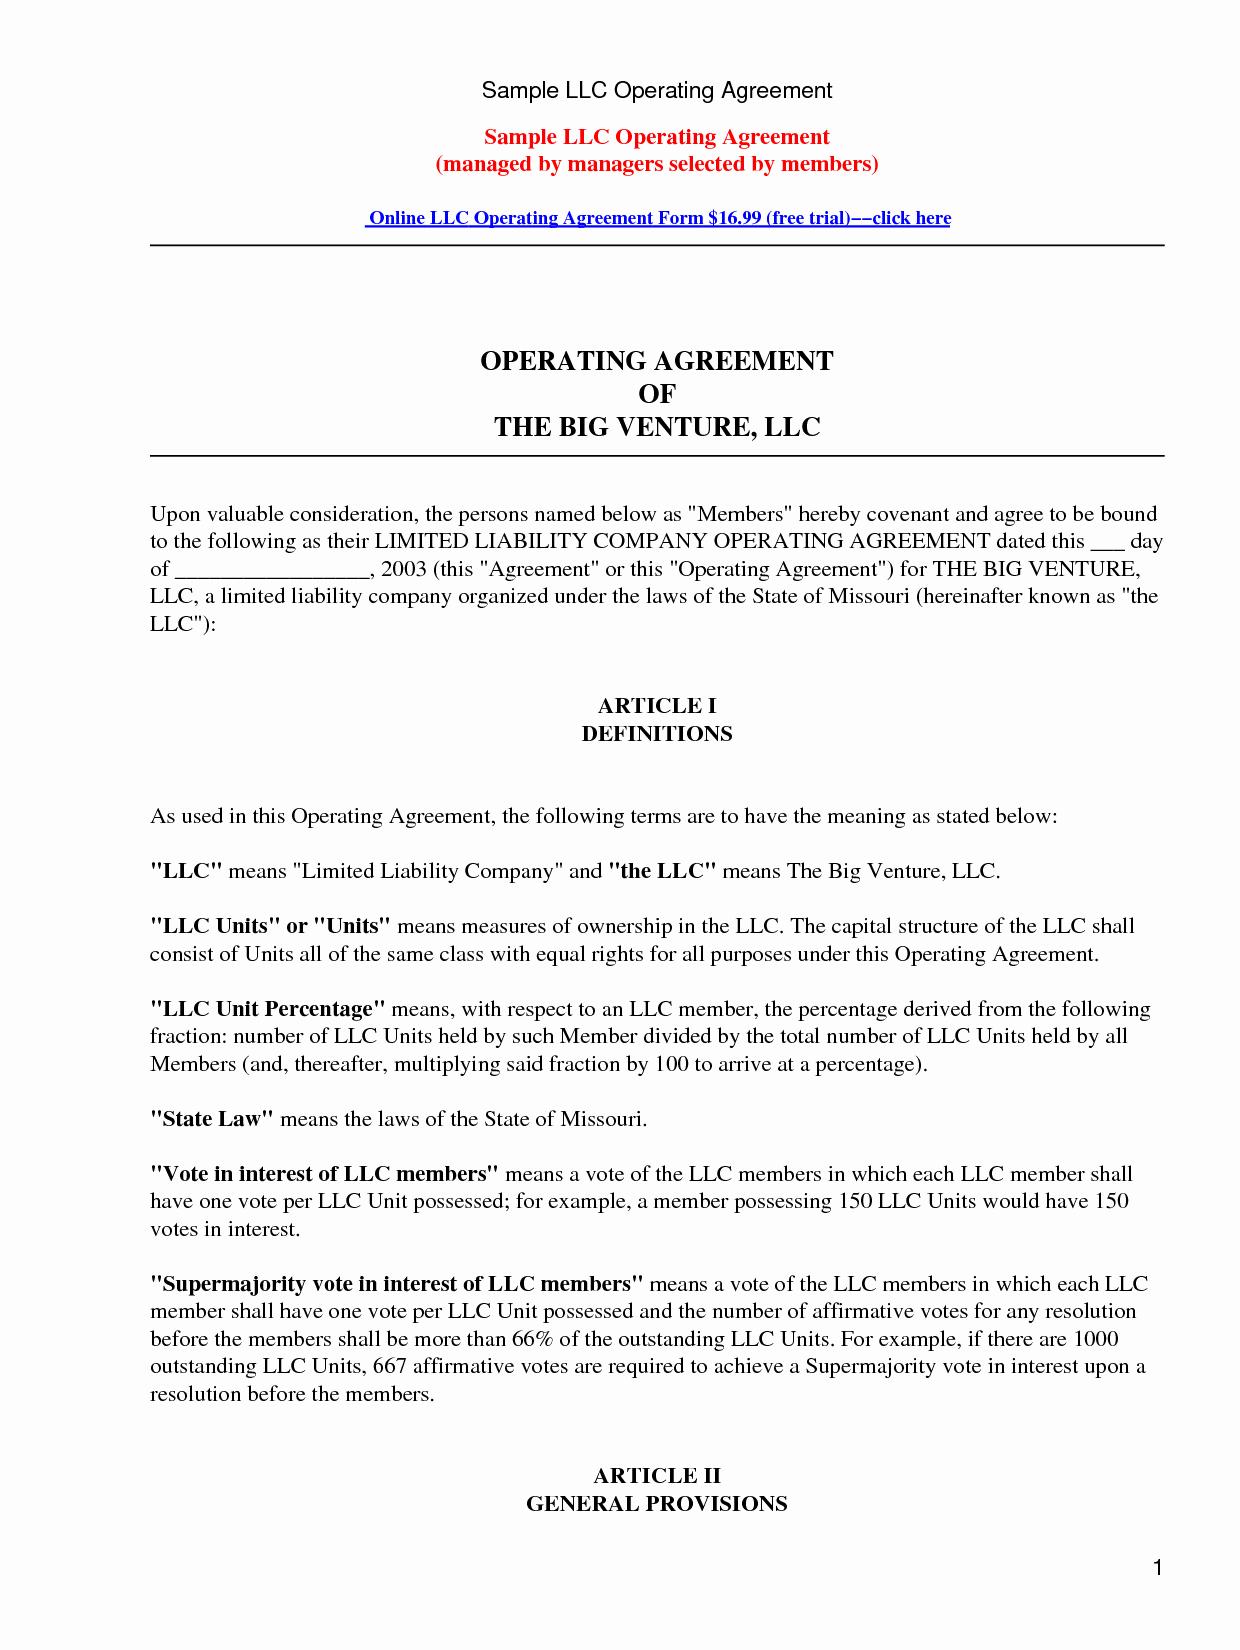 Sample Partnership Agreement form Portablegasgrillweber